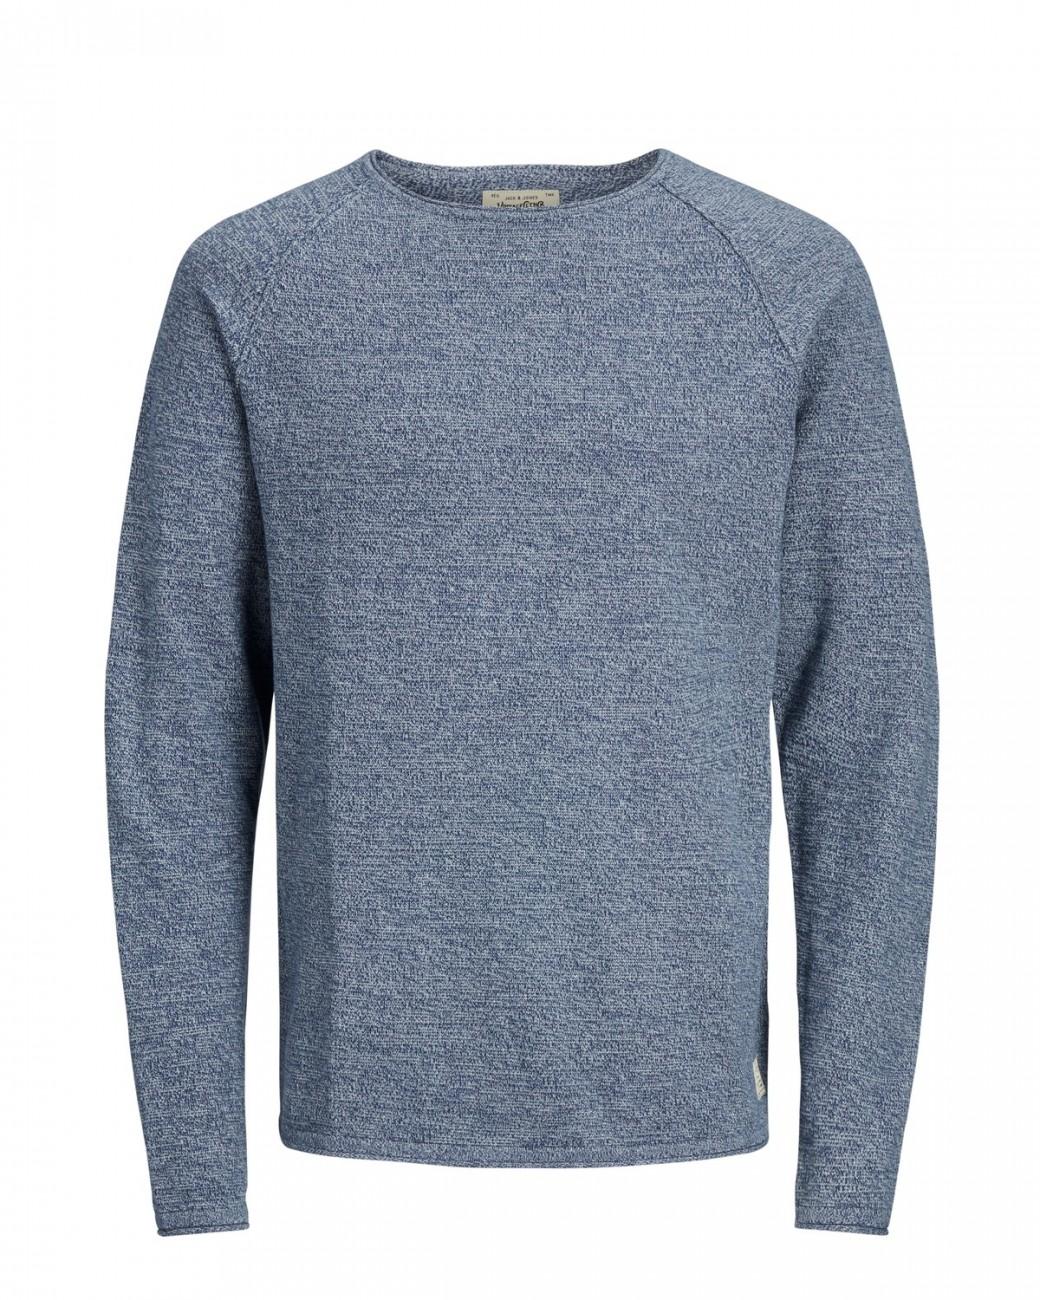 jack jones herren pullover jorunion knit crew neck. Black Bedroom Furniture Sets. Home Design Ideas